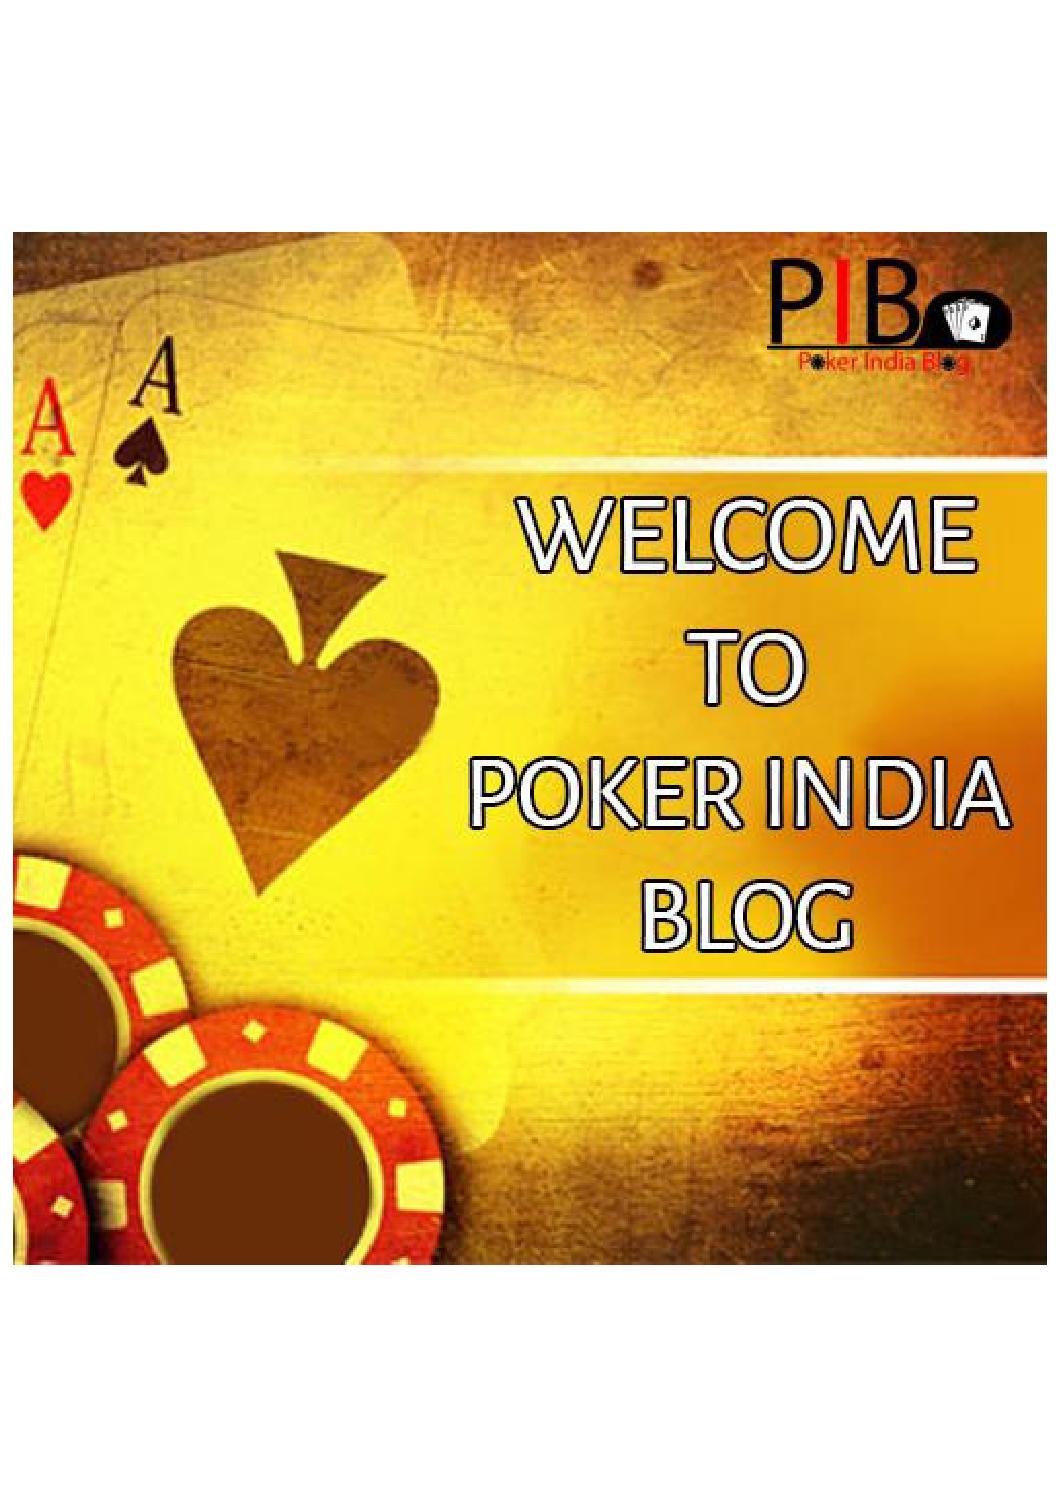 Poker websites in india